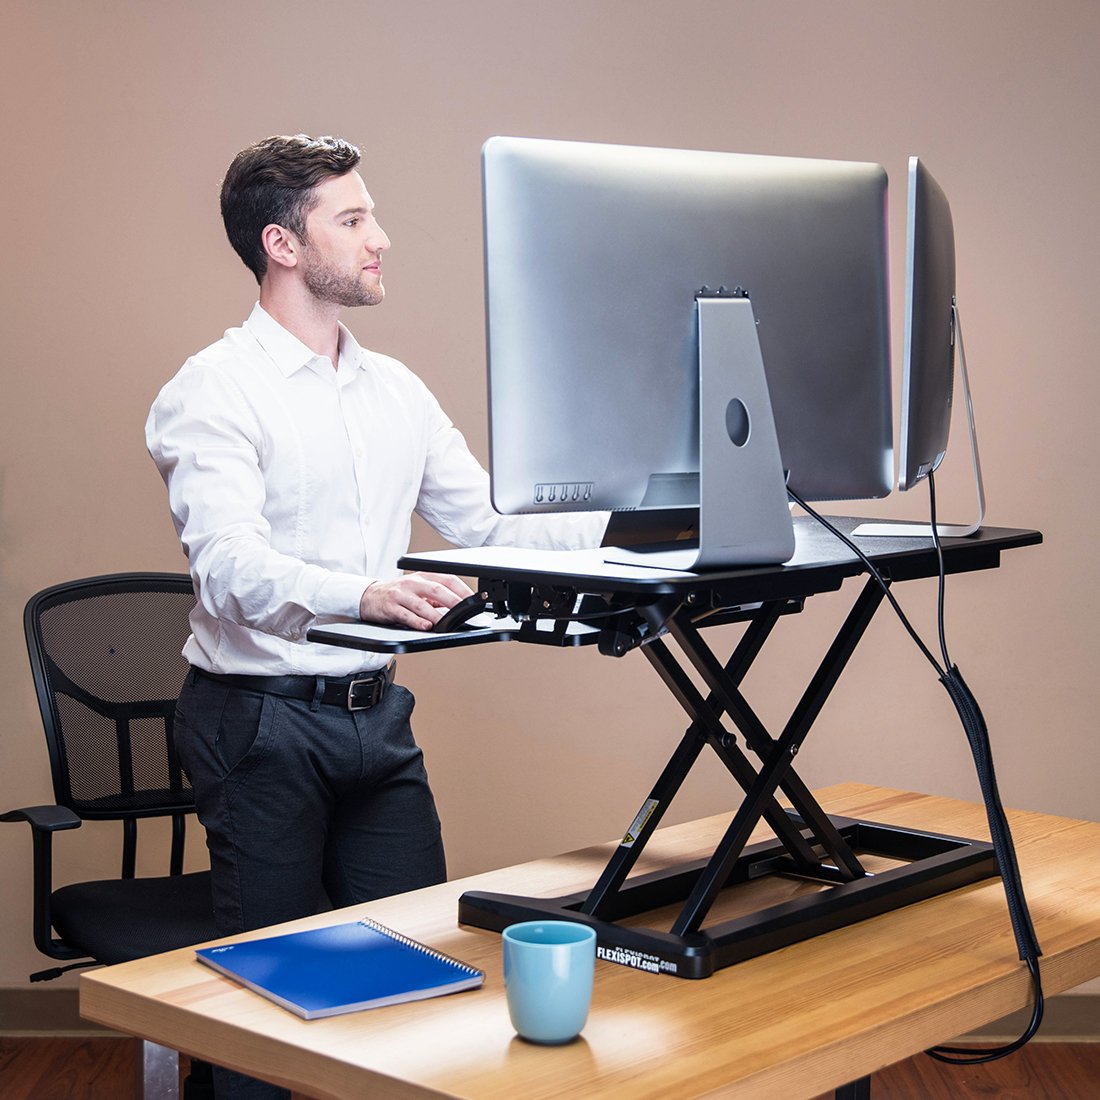 "FlexiSpot Standing Desk Hight Adjustable Desk Riser with Deep Keyboard Tray for Laptop - 35"" - Black - M7MB-SBA"